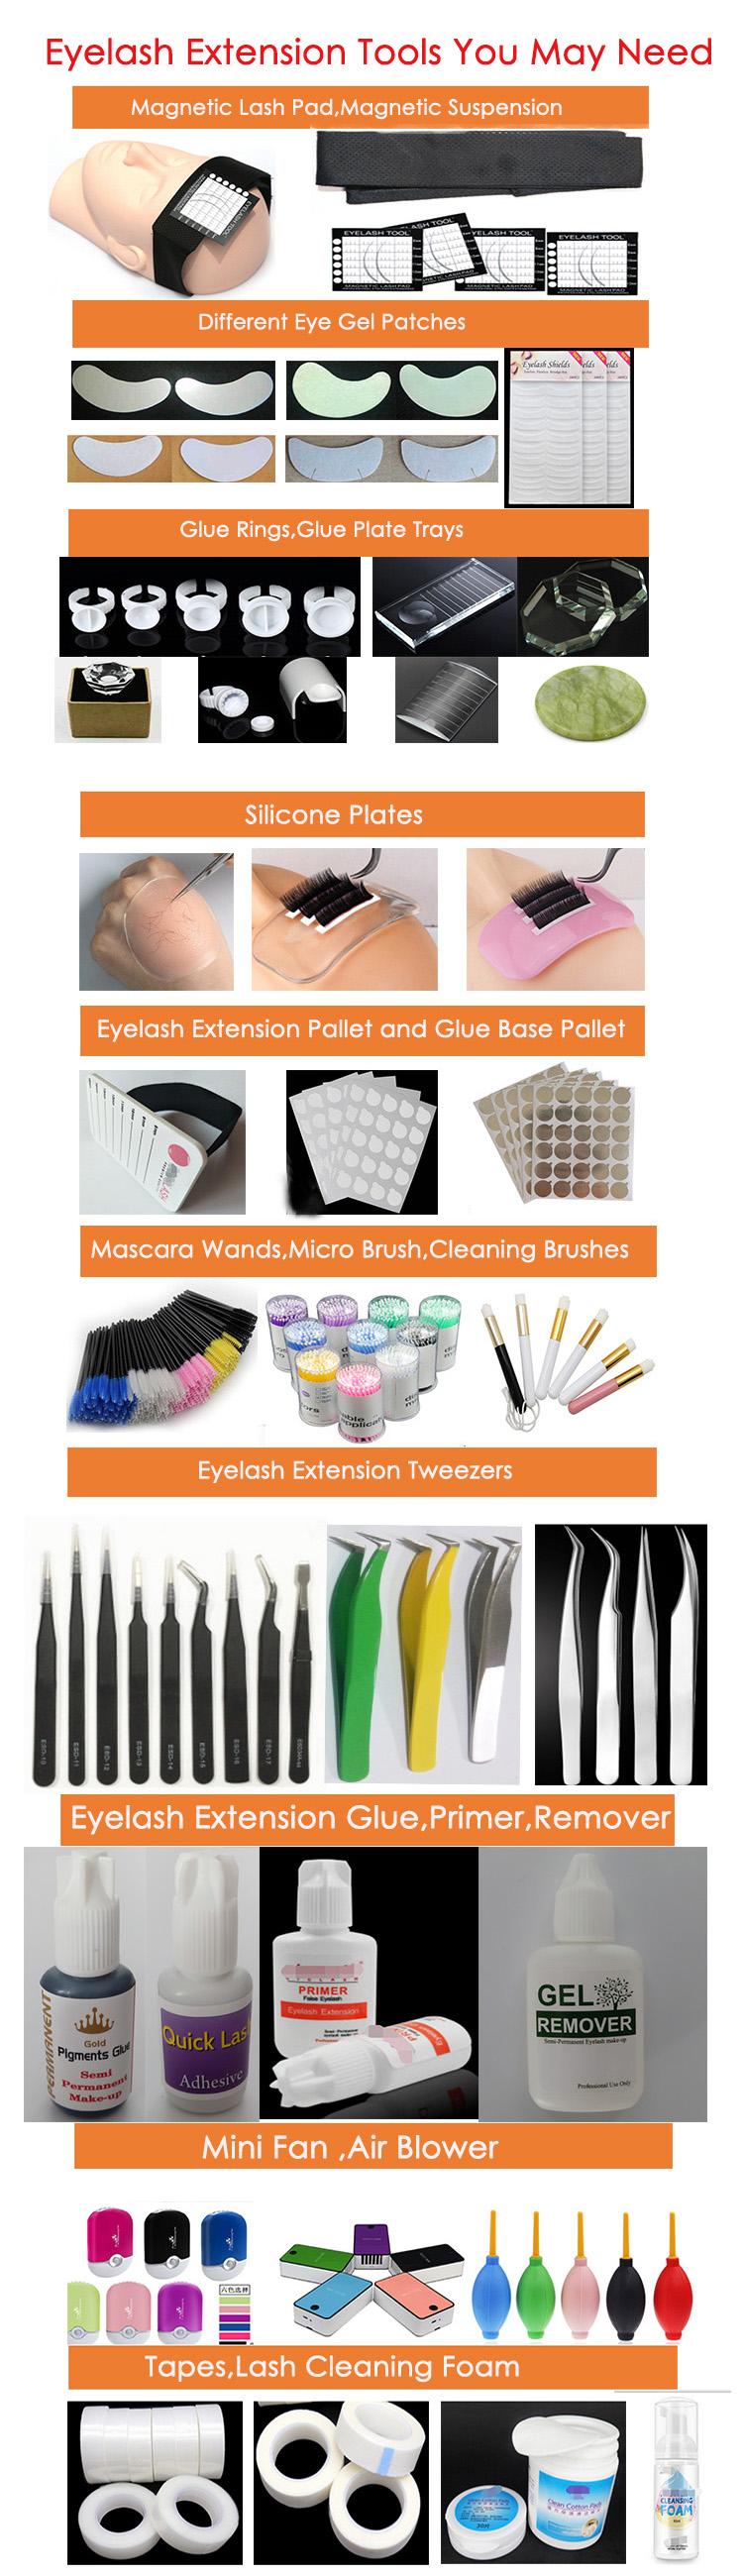 lash-extensions-tools-factory-supply-China.jpg